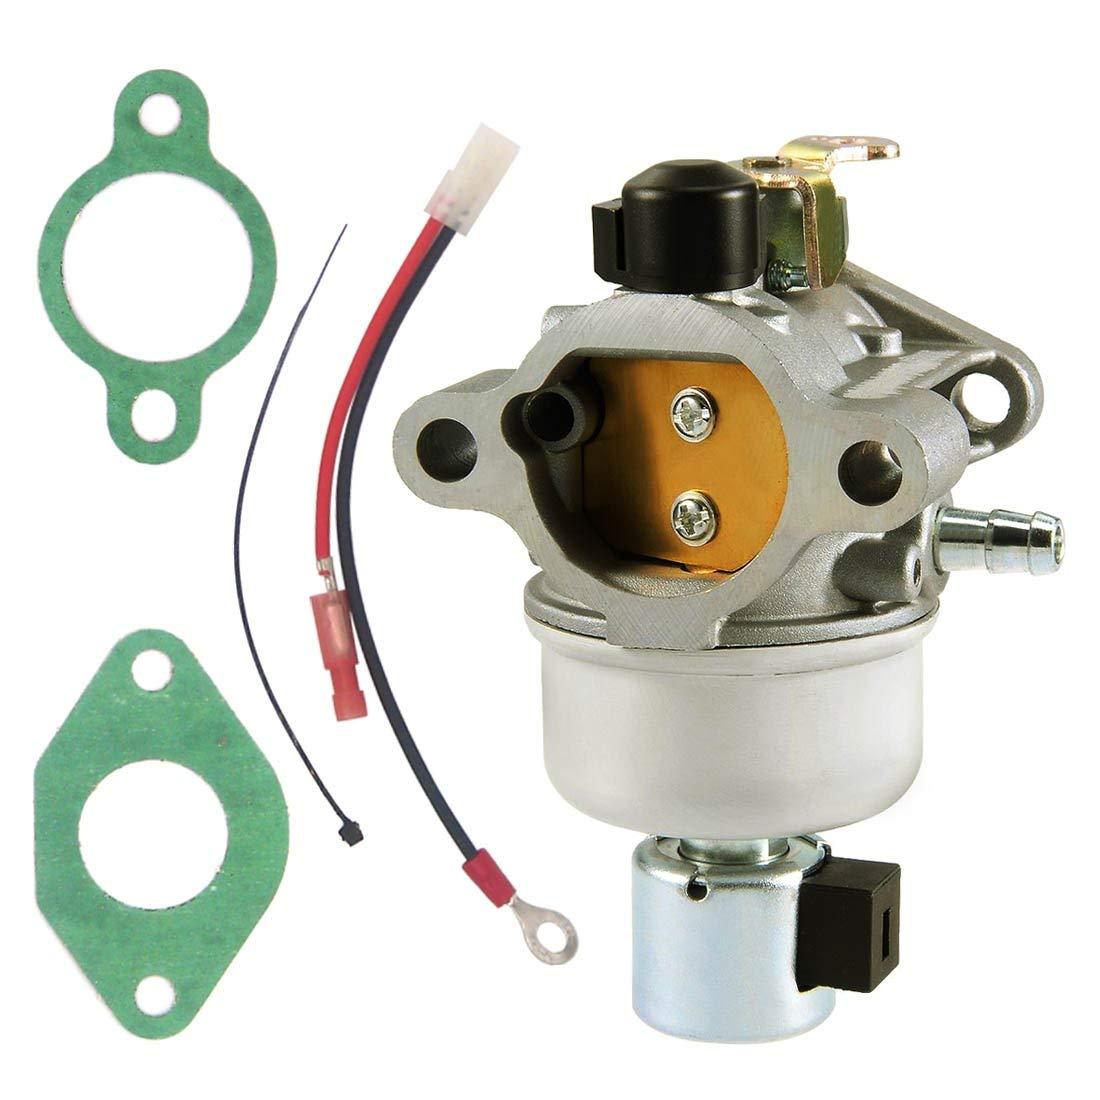 Carburetor Carb for KOHLER CV15T CV16S CV15S CV13S 12-853-82 12-853-139-s 4285303 4285303-S